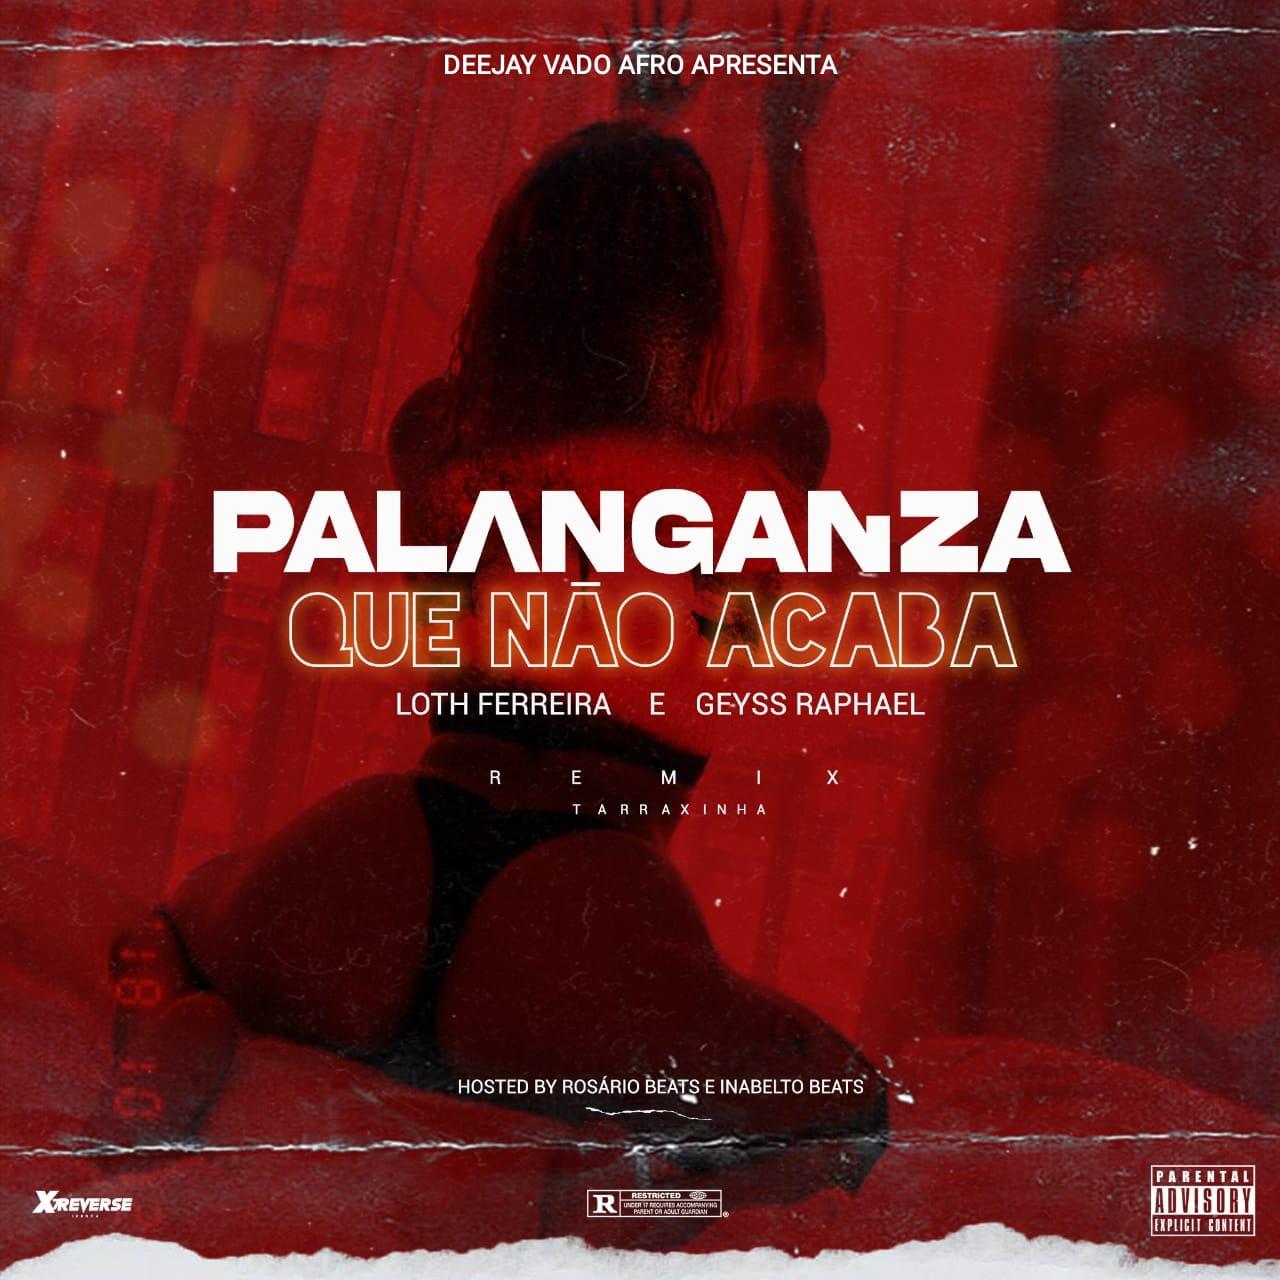 Deejay Vado Afro - Palanganza Que Não Acaba (feat. Loth Ferreira & Geyss Raphael)